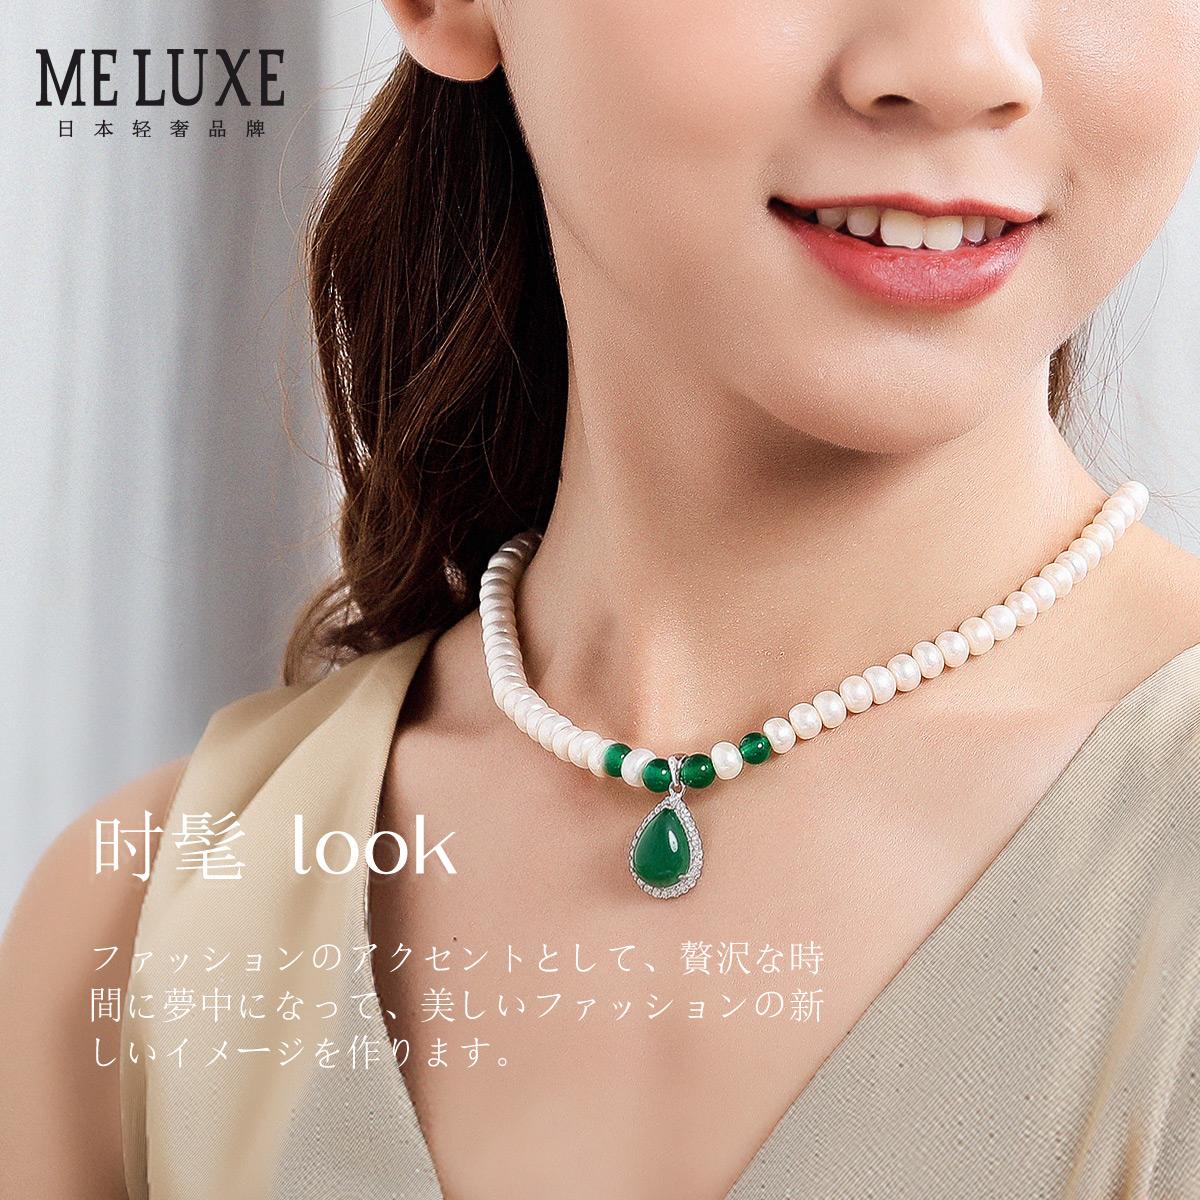 MELUX 富贵如意绿玉髓镶嵌淡水珍珠项链全珠链送长辈